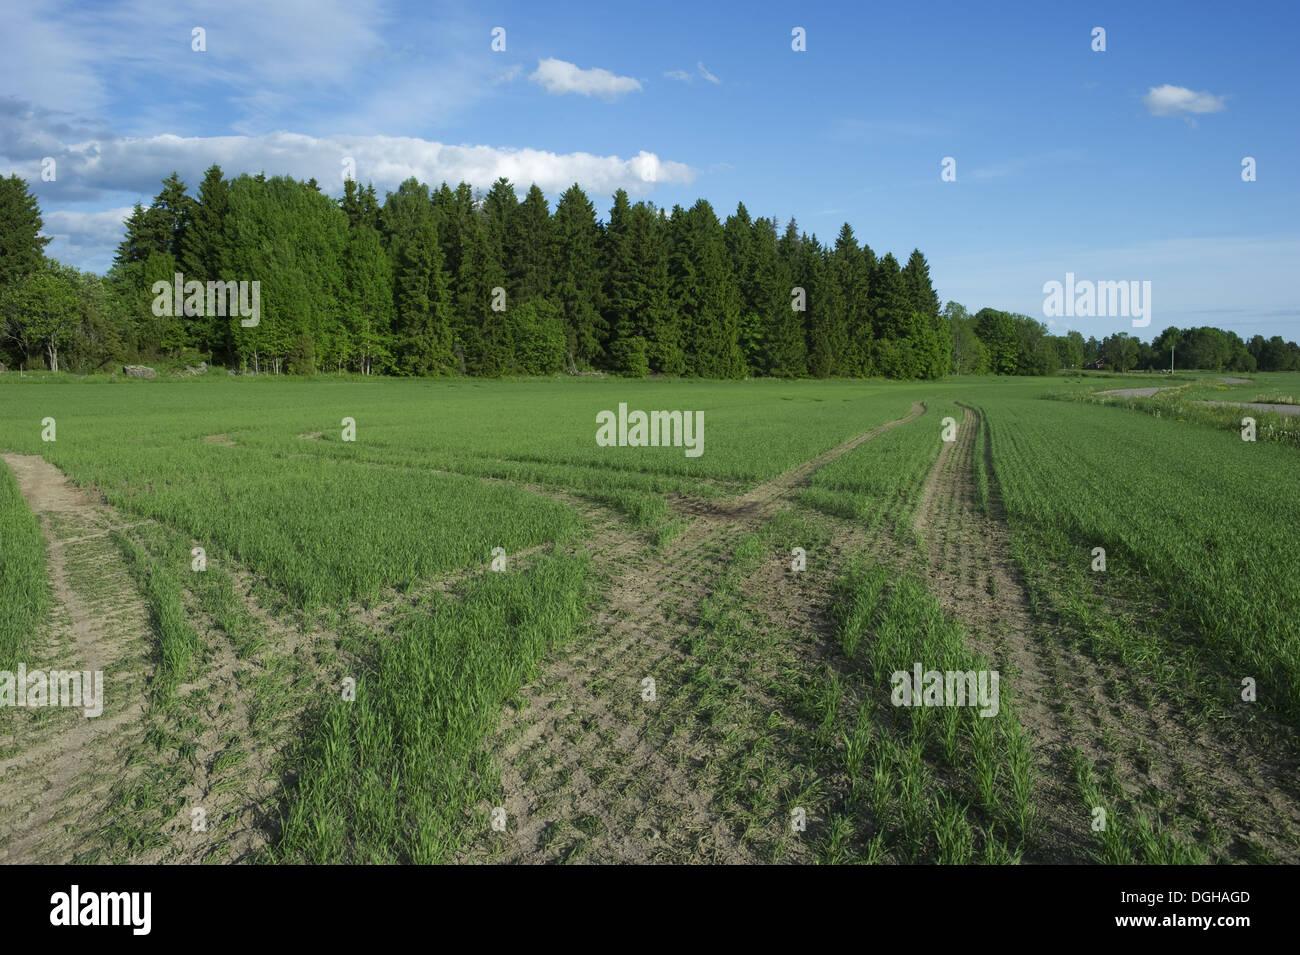 Tramlines in arable field with seedling crop, Sweden, june Stock Photo